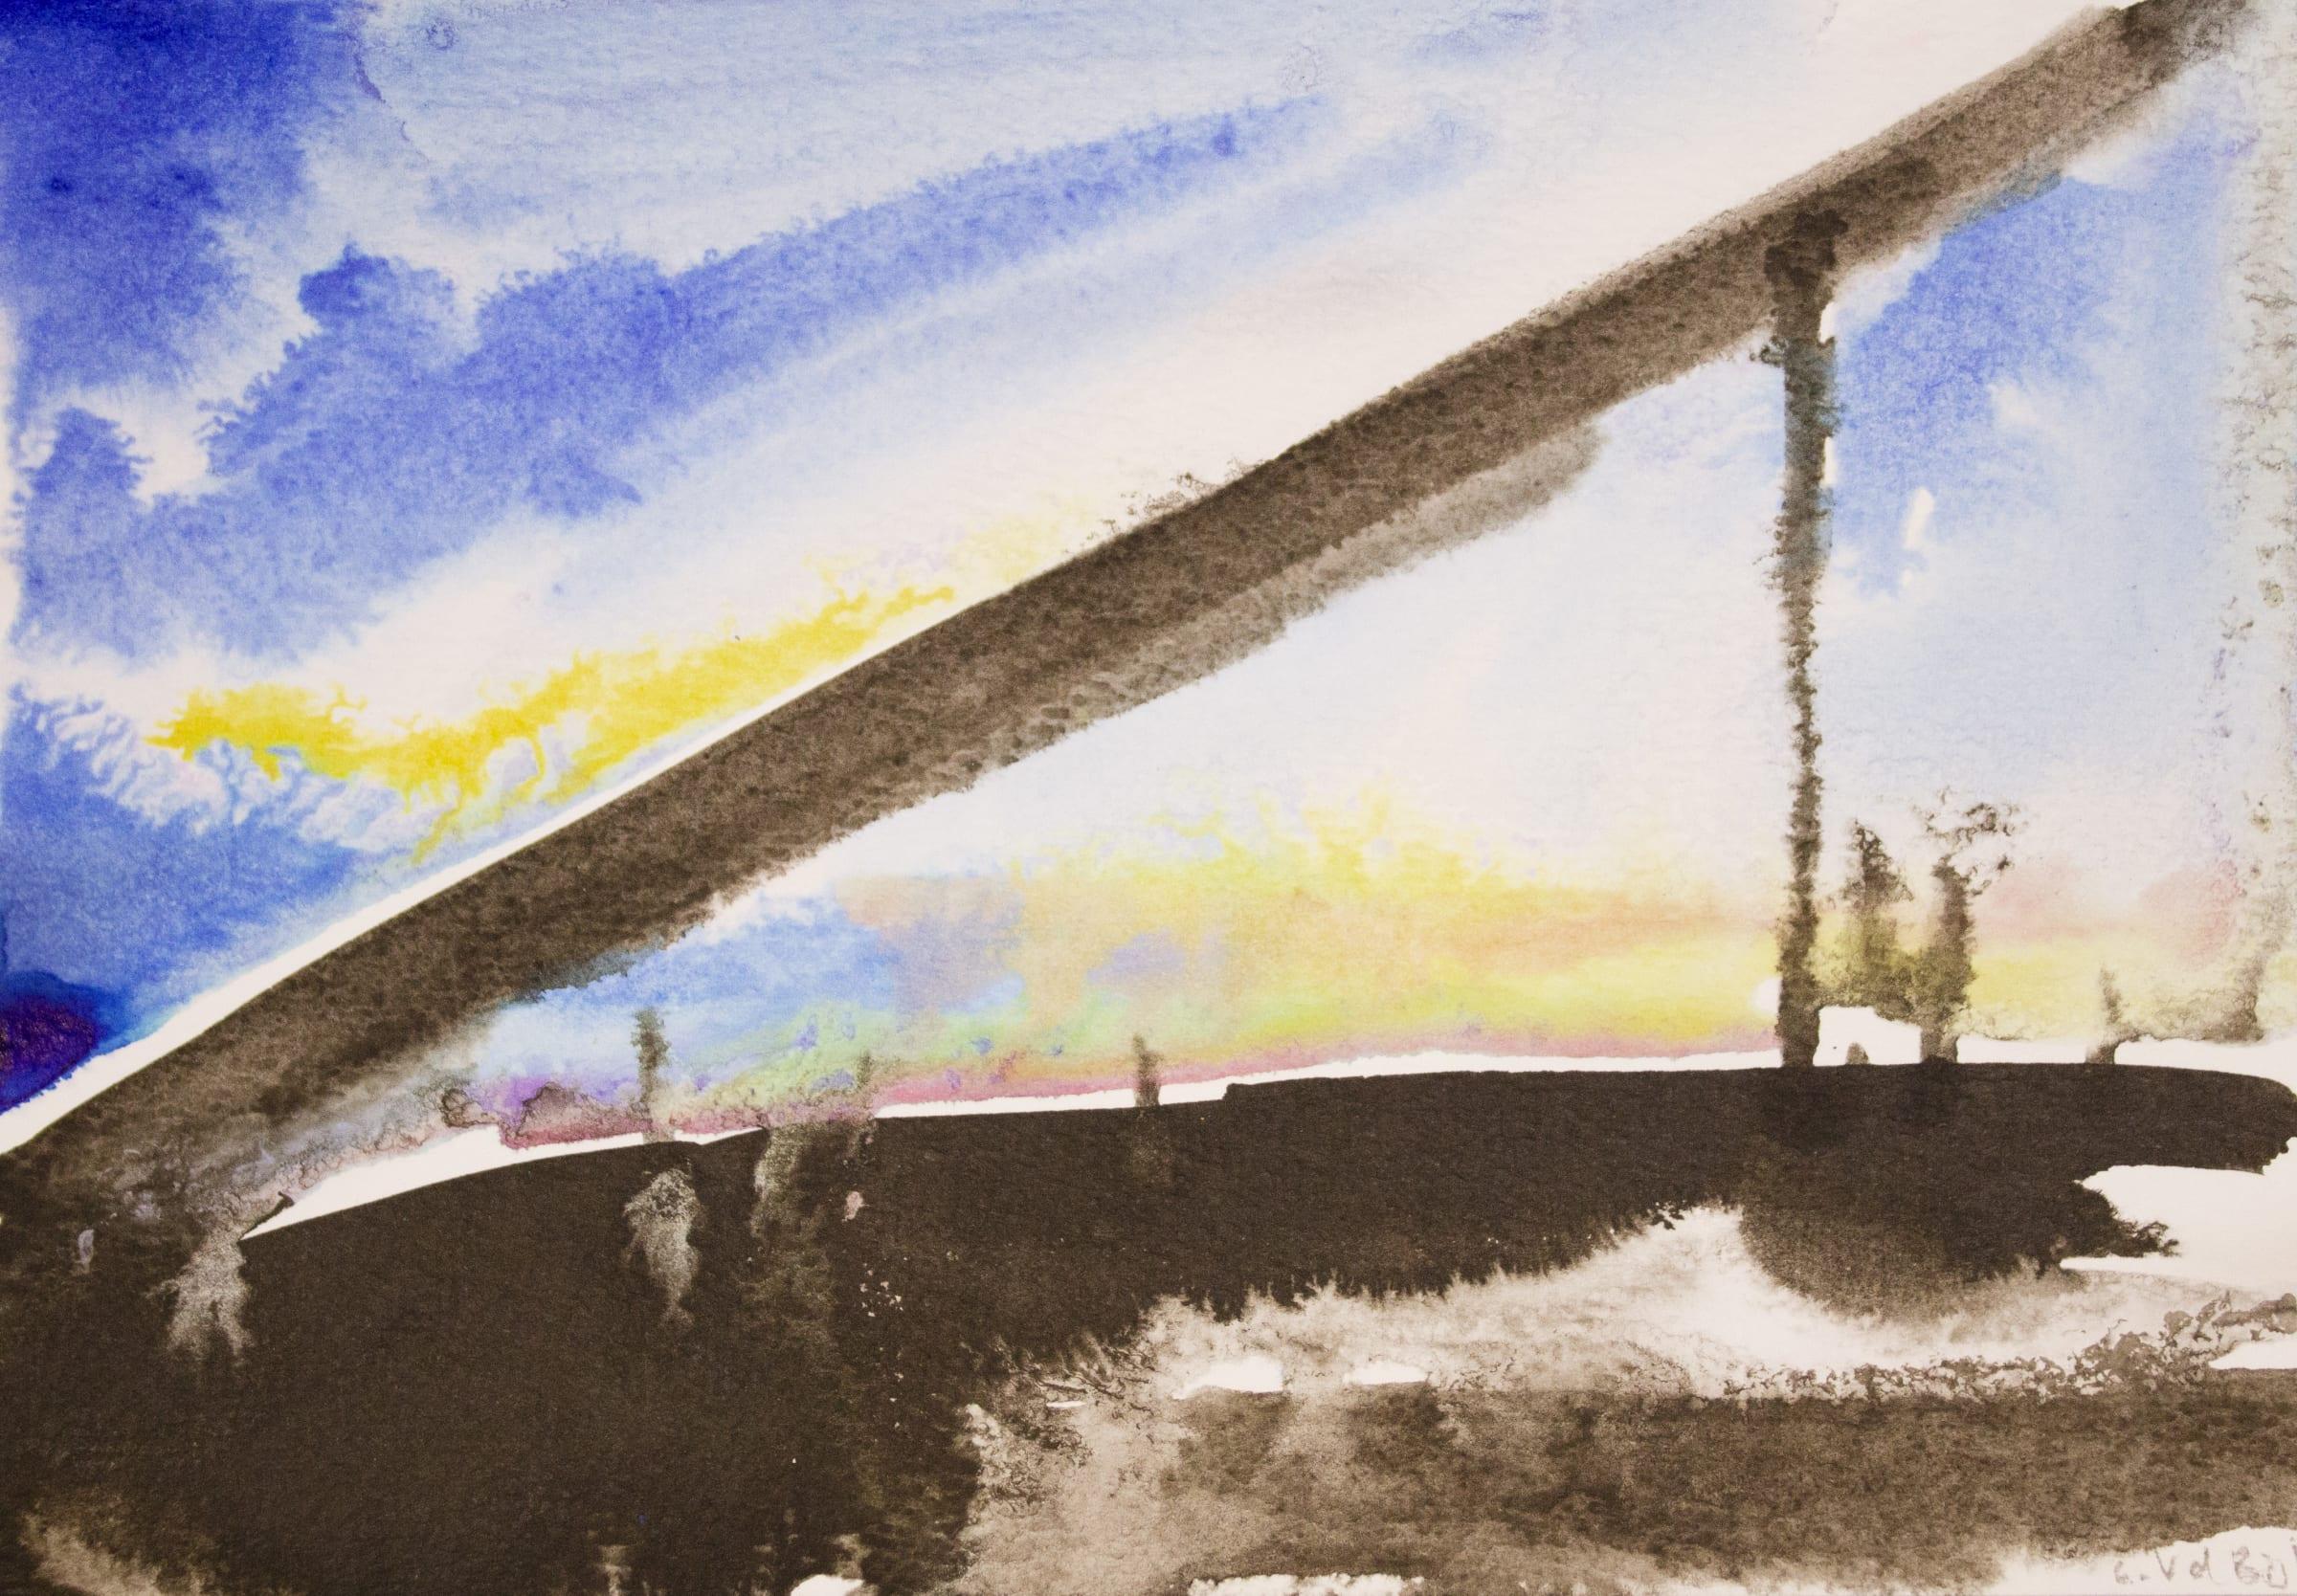 <span class=&#34;link fancybox-details-link&#34;><a href=&#34;/artists/88-louise-van-der-bijl/works/2291-louise-van-der-bijl-inktober-day-28-2018/&#34;>View Detail Page</a></span><div class=&#34;artist&#34;><strong>Louise Van Der Bijl</strong></div> <div class=&#34;title&#34;><em>Inktober Day 28</em>, 2018</div> <div class=&#34;medium&#34;>Ink On Paper</div> <div class=&#34;dimensions&#34;>15cm x 21.3cm</div><div class=&#34;price&#34;>R400.00</div>